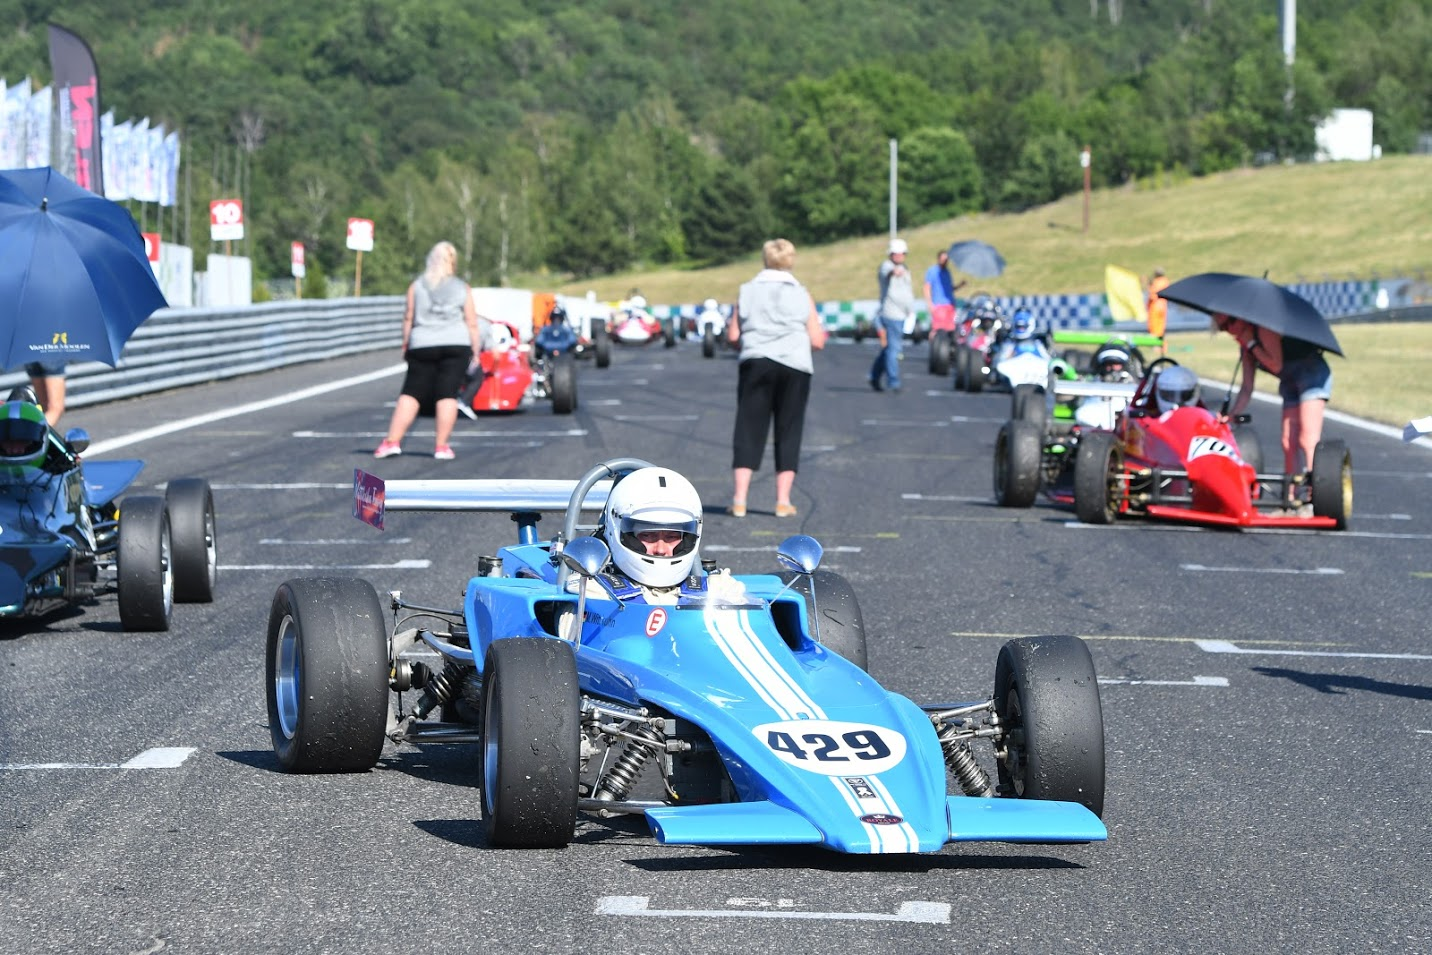 190630-Most-15-Agentur_Autosport.at_Dirk_Hartung-6833